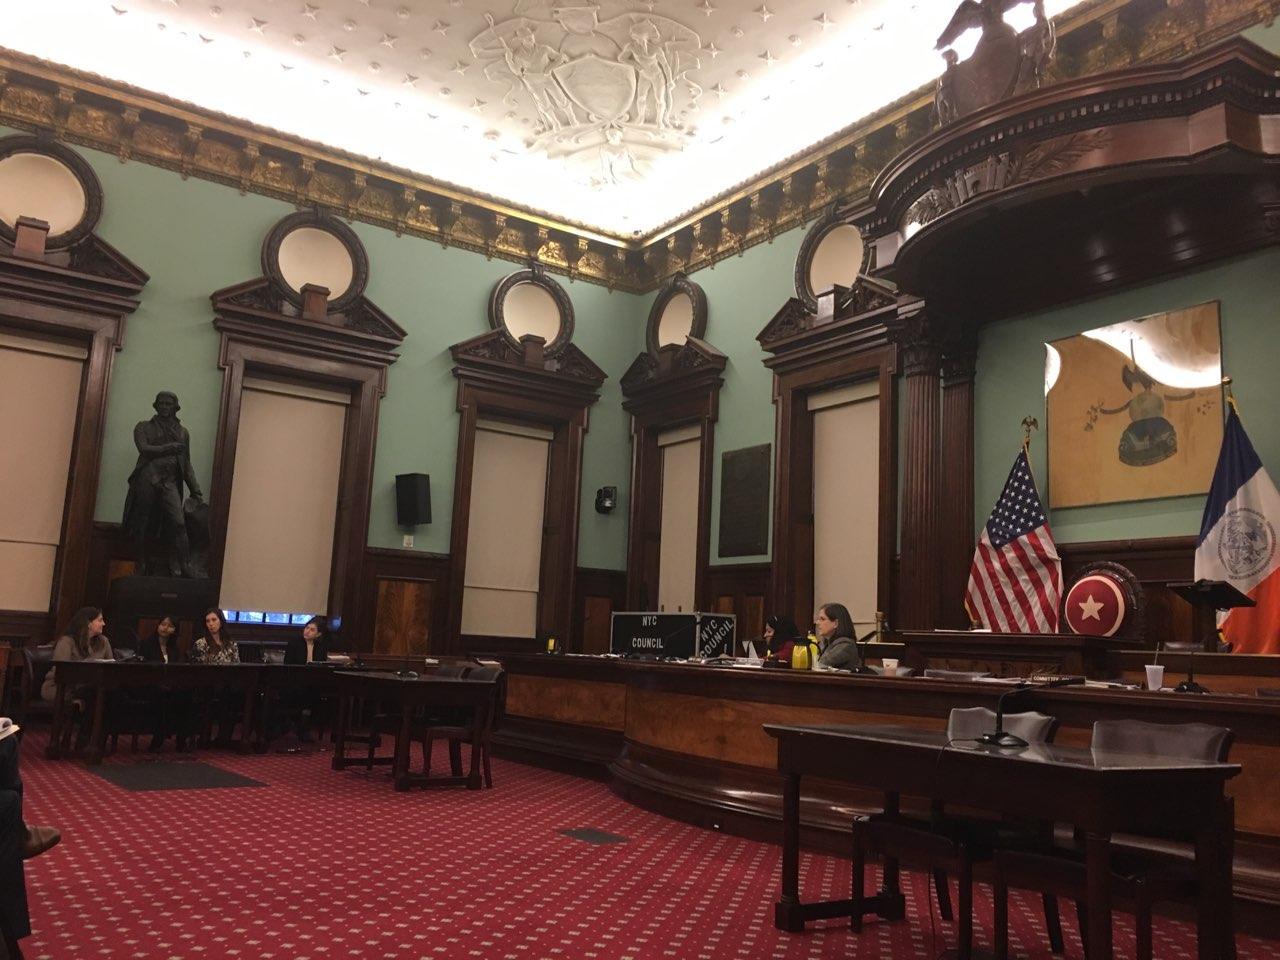 City Hall Hearing_2018-02-28 17.45.22_Jerin_best.jpg